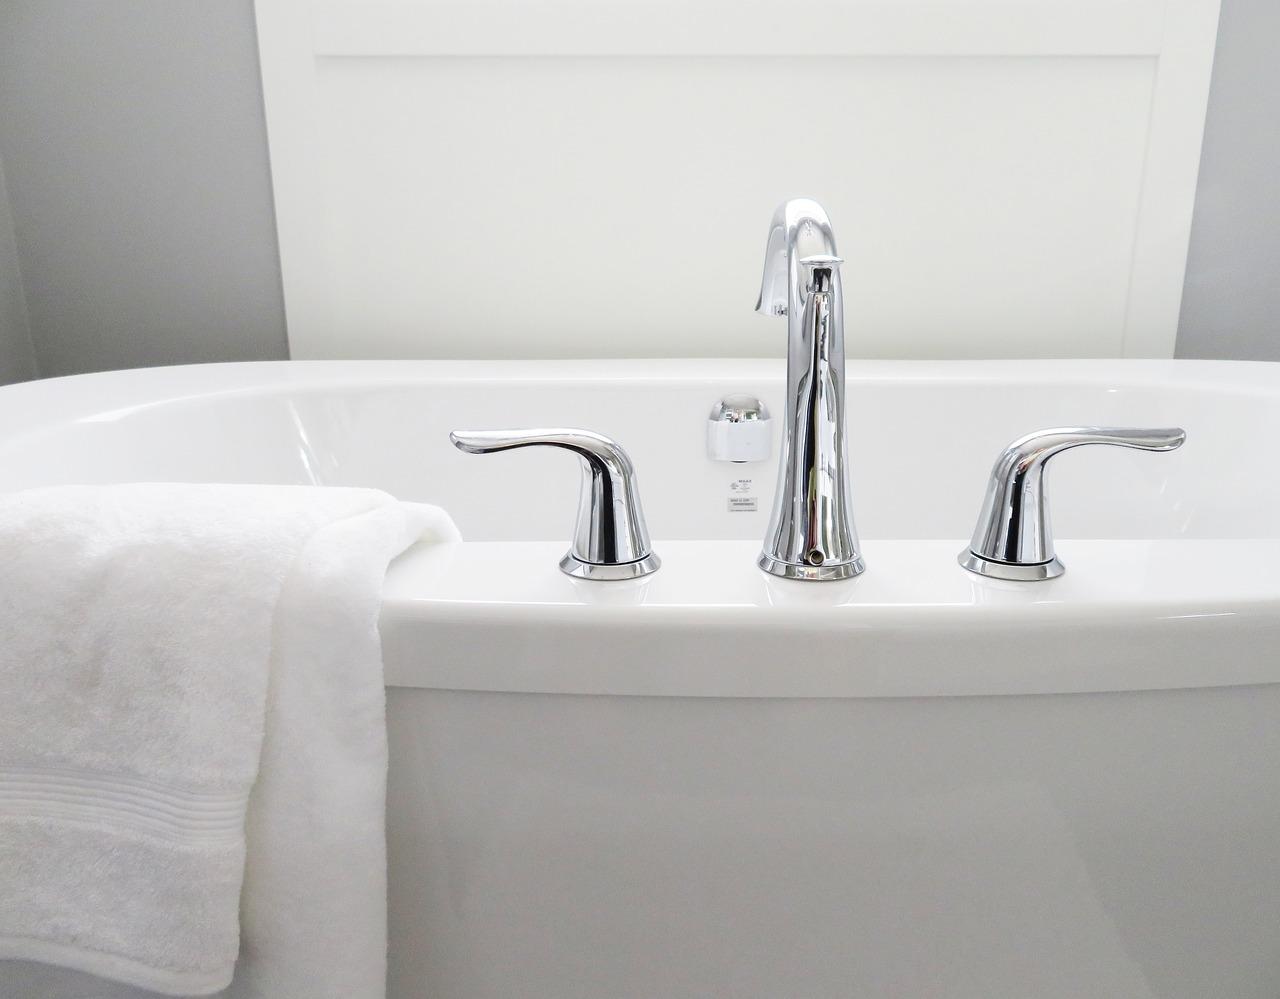 remodel your bathroom